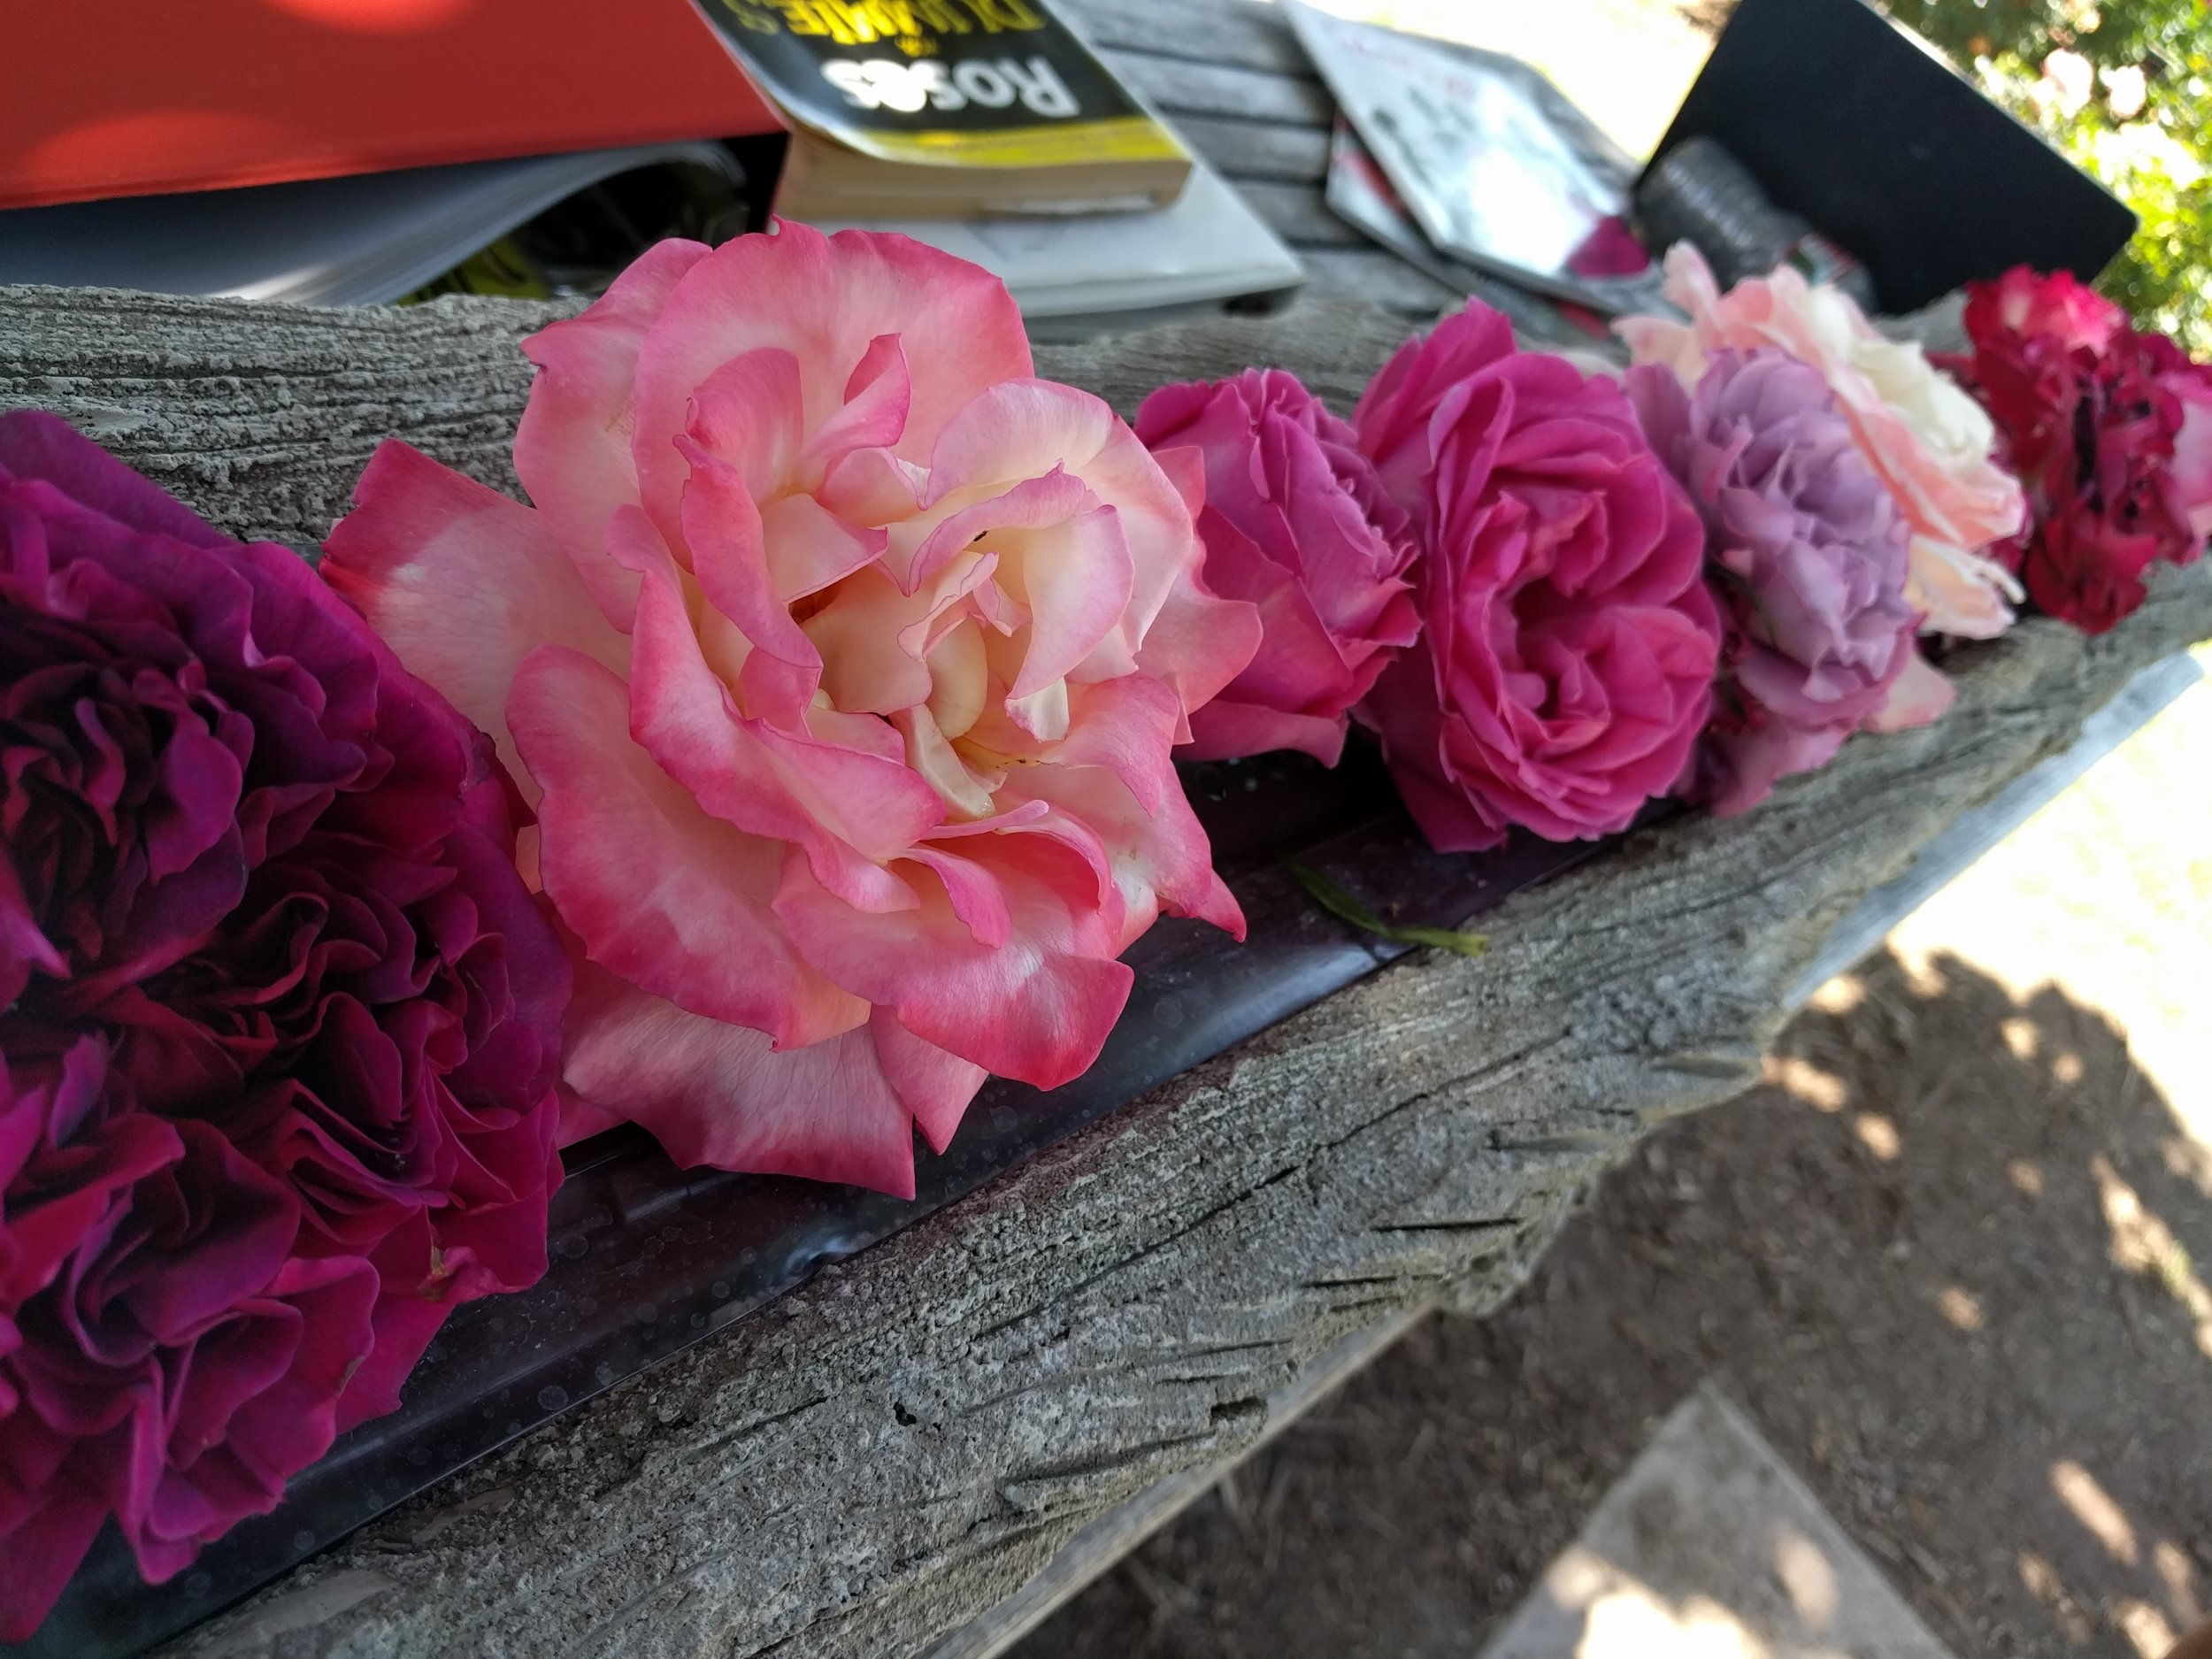 Roses at the Huntington Botanical Gardens, San Marino, CA